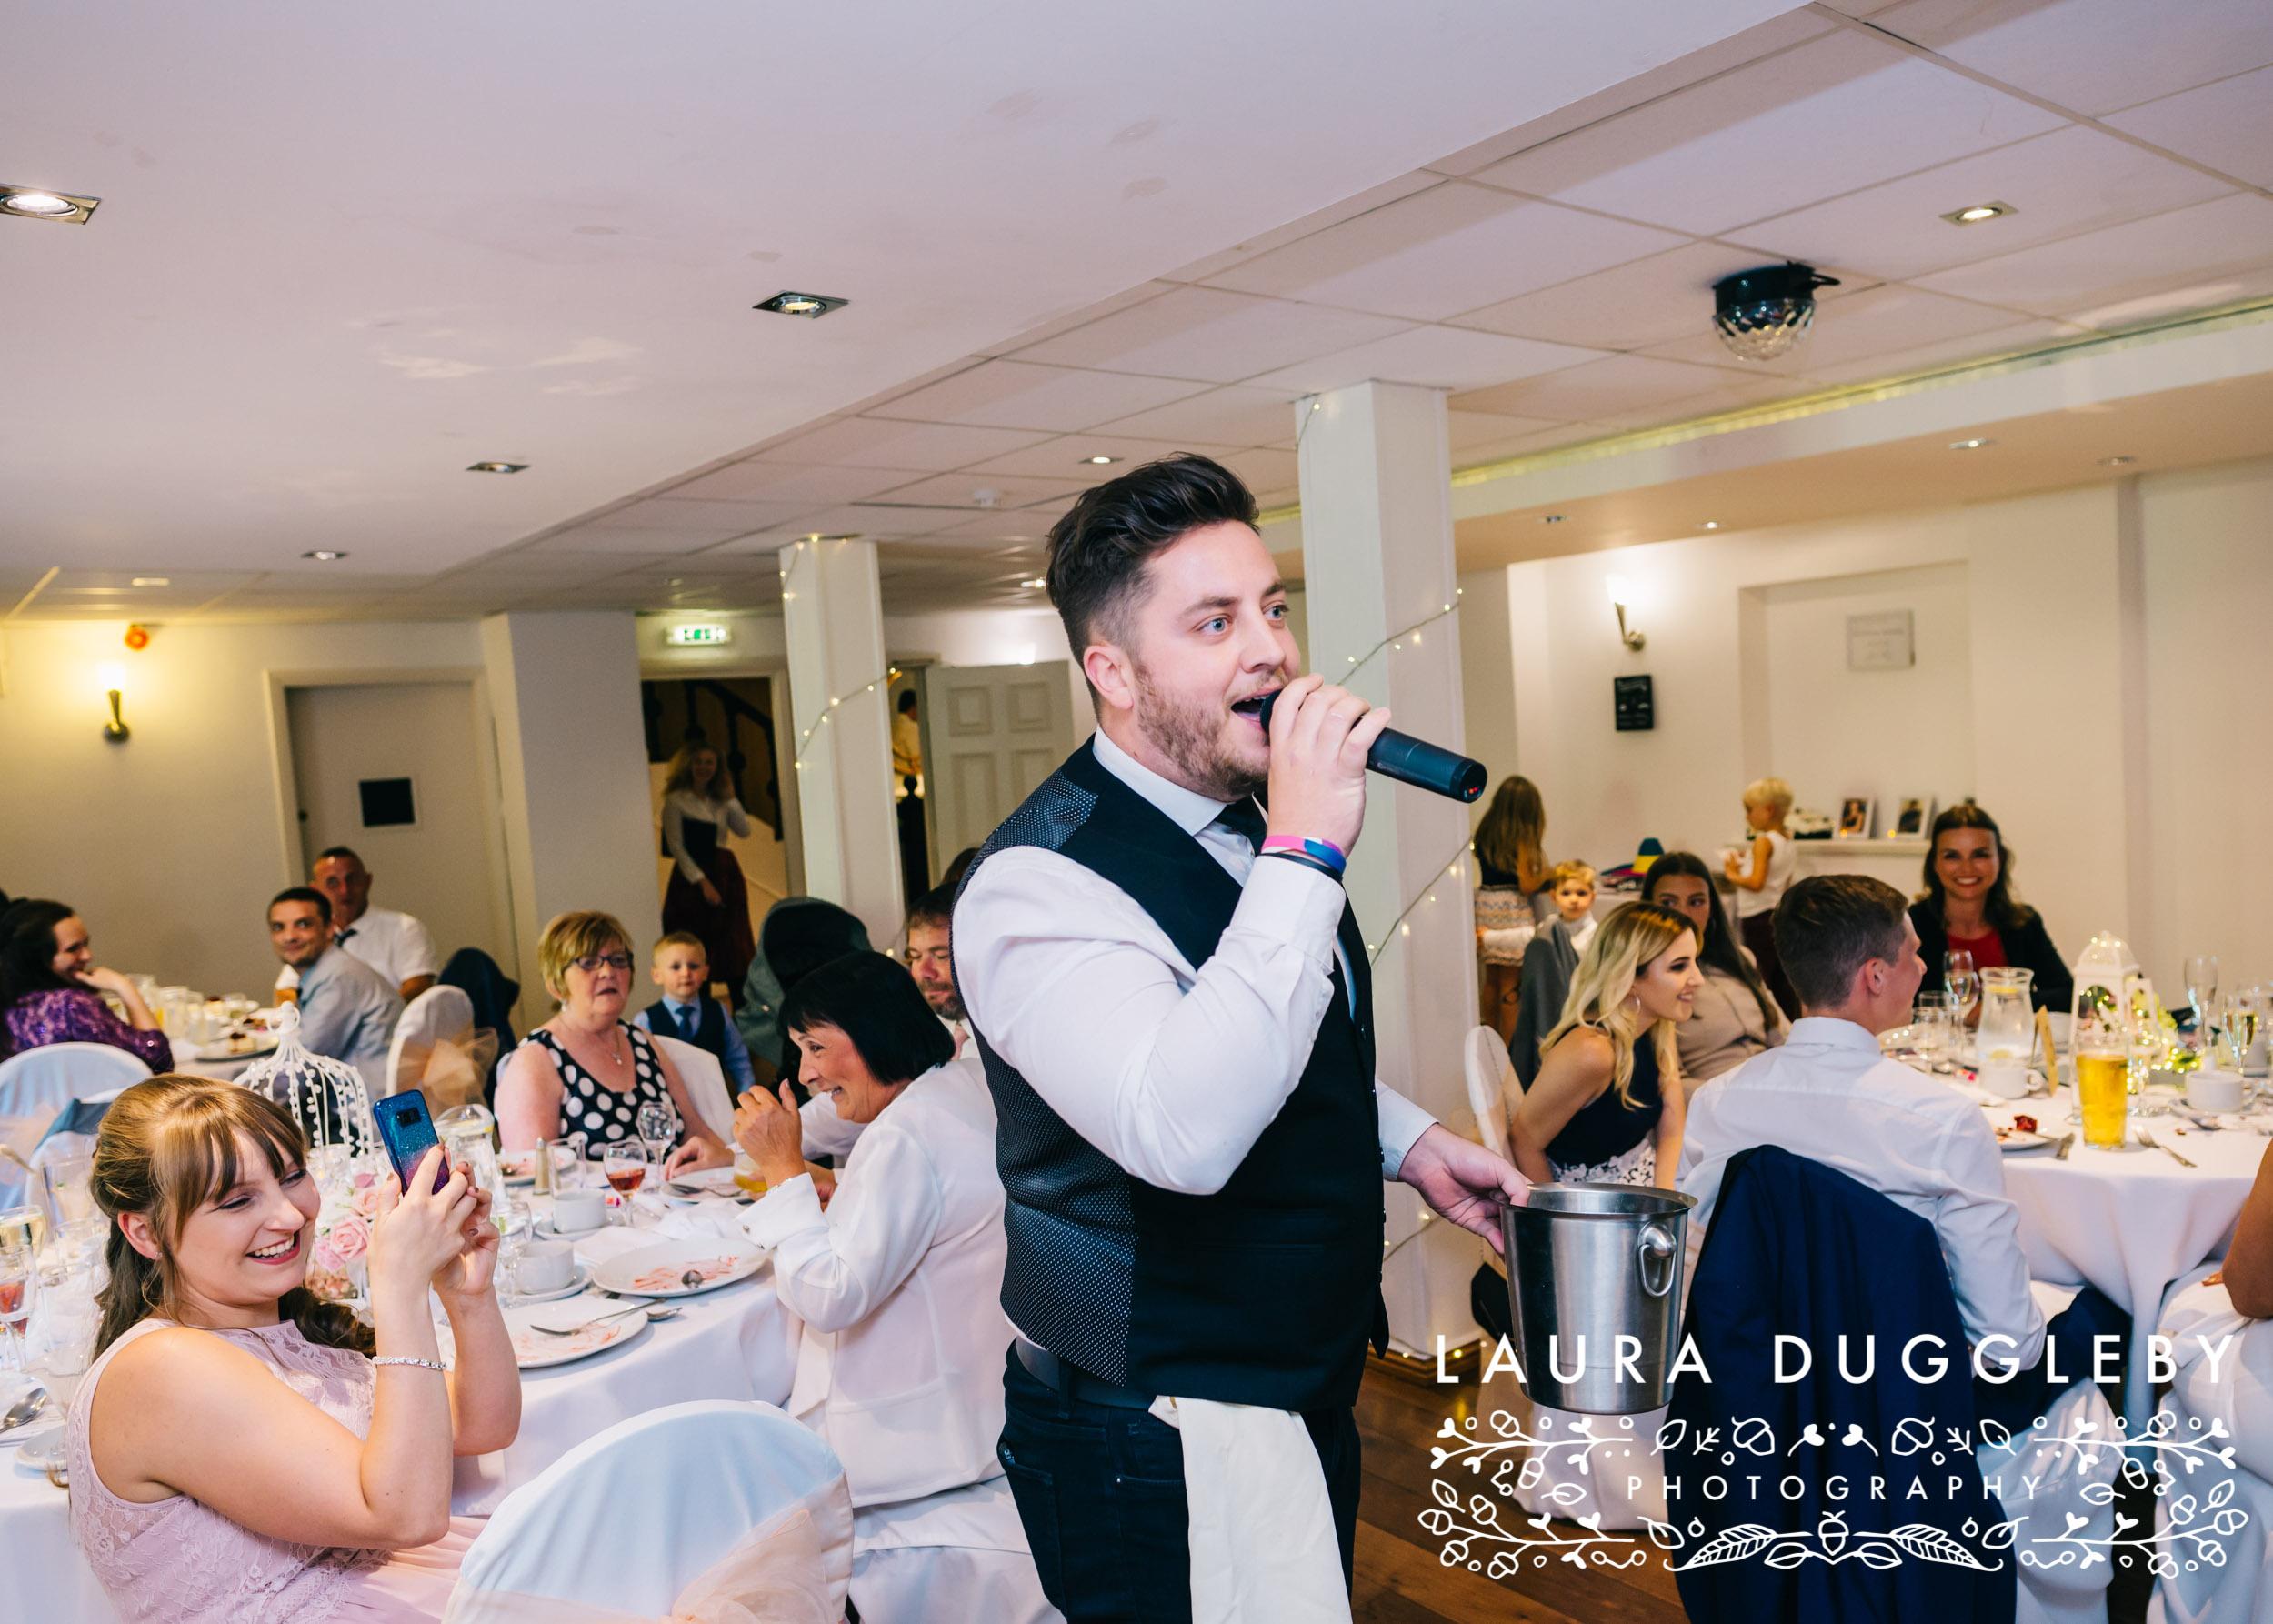 Accrington Wedding Photographer - Sparth House Hotel26